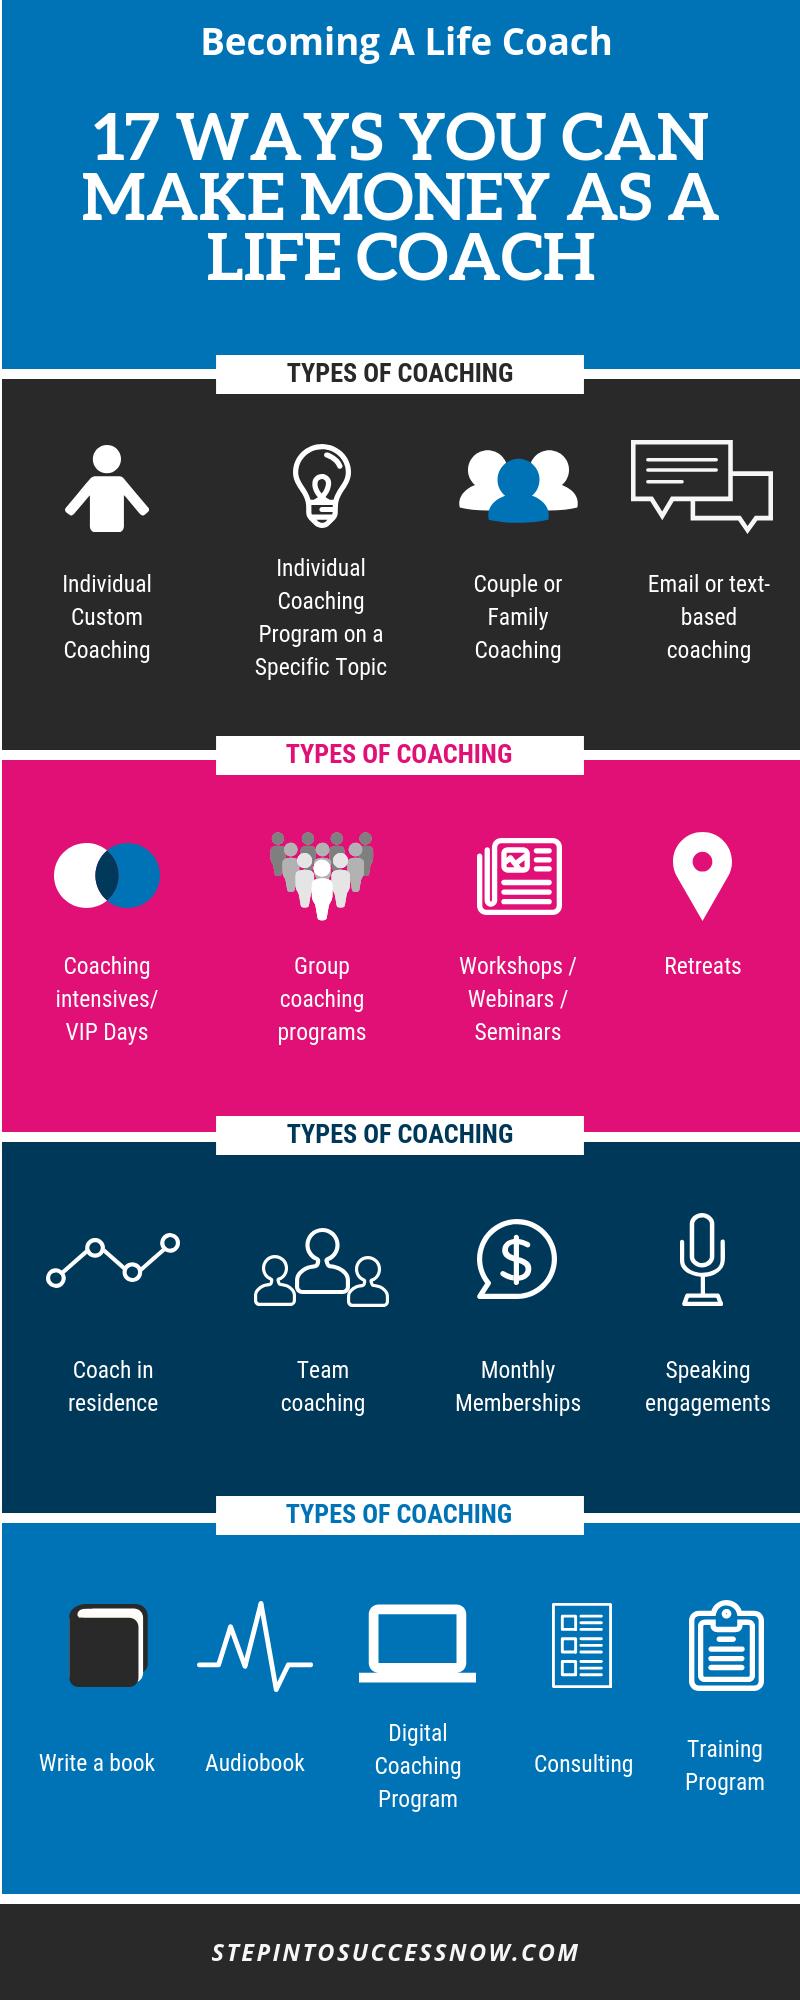 How to make money as a coach